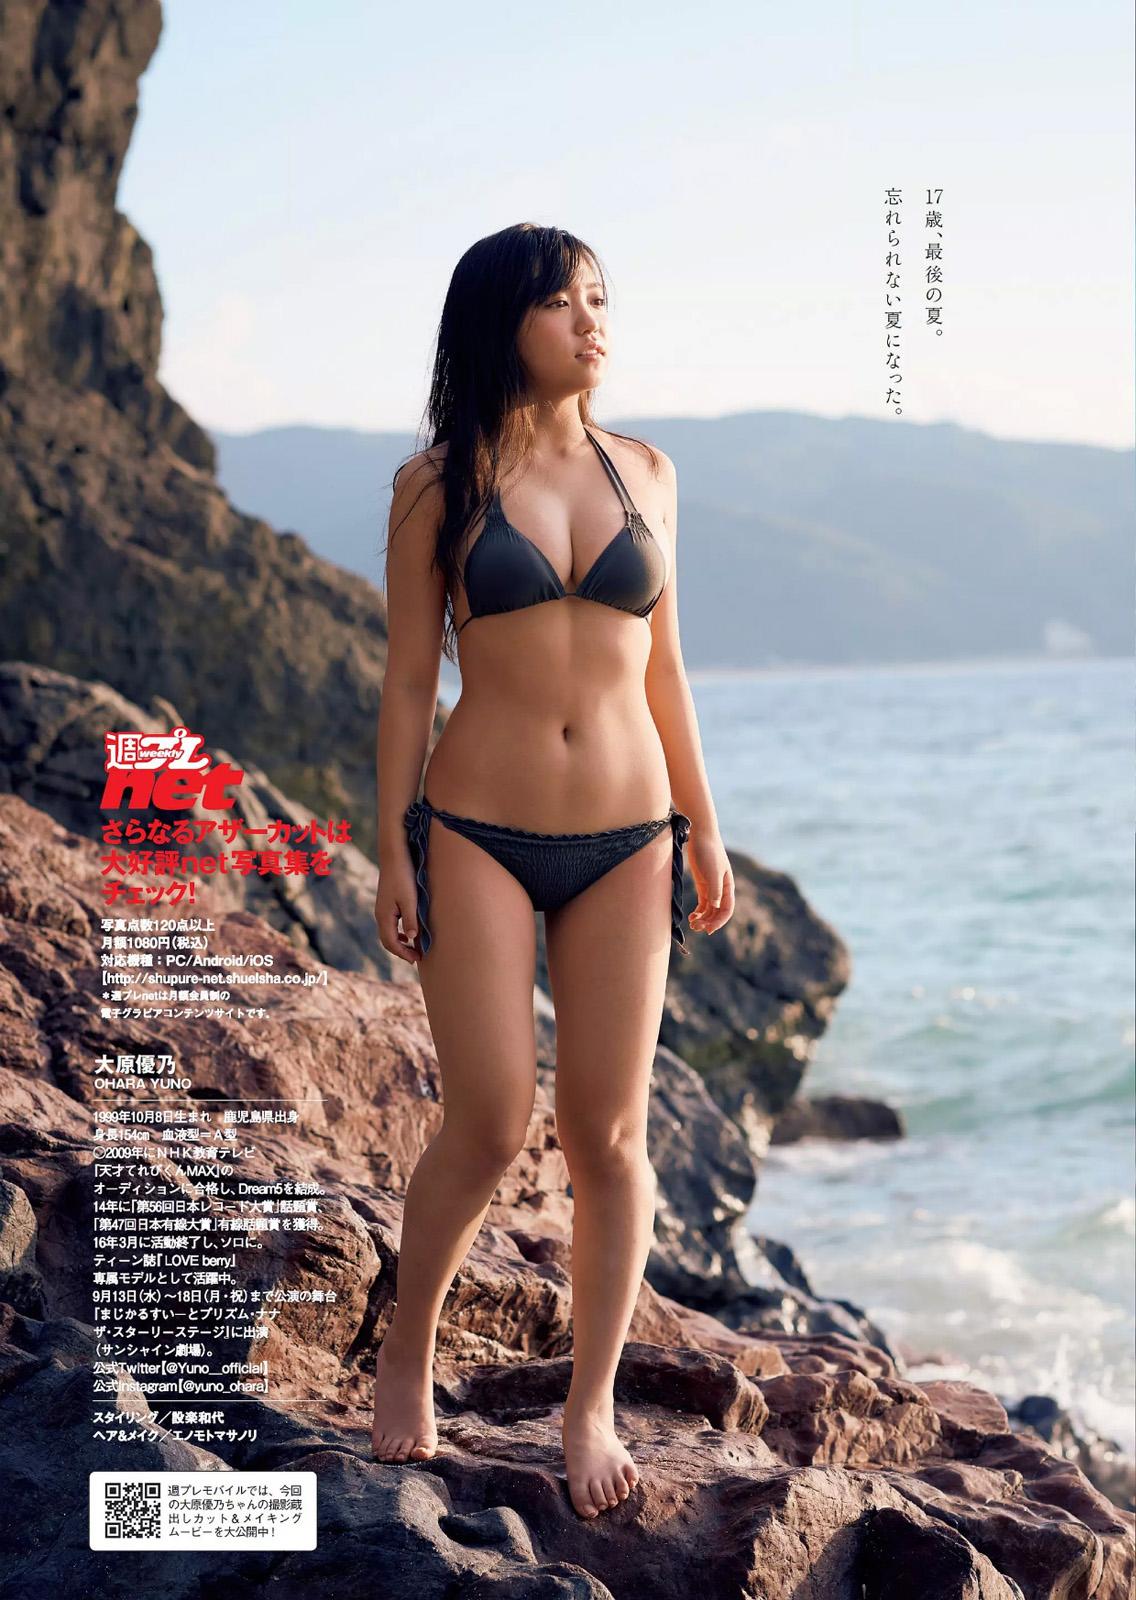 Yuno Ohara 大原優乃, Weekly Playboy 2017 No.38 (週刊プレイボーイ 2017年38号)